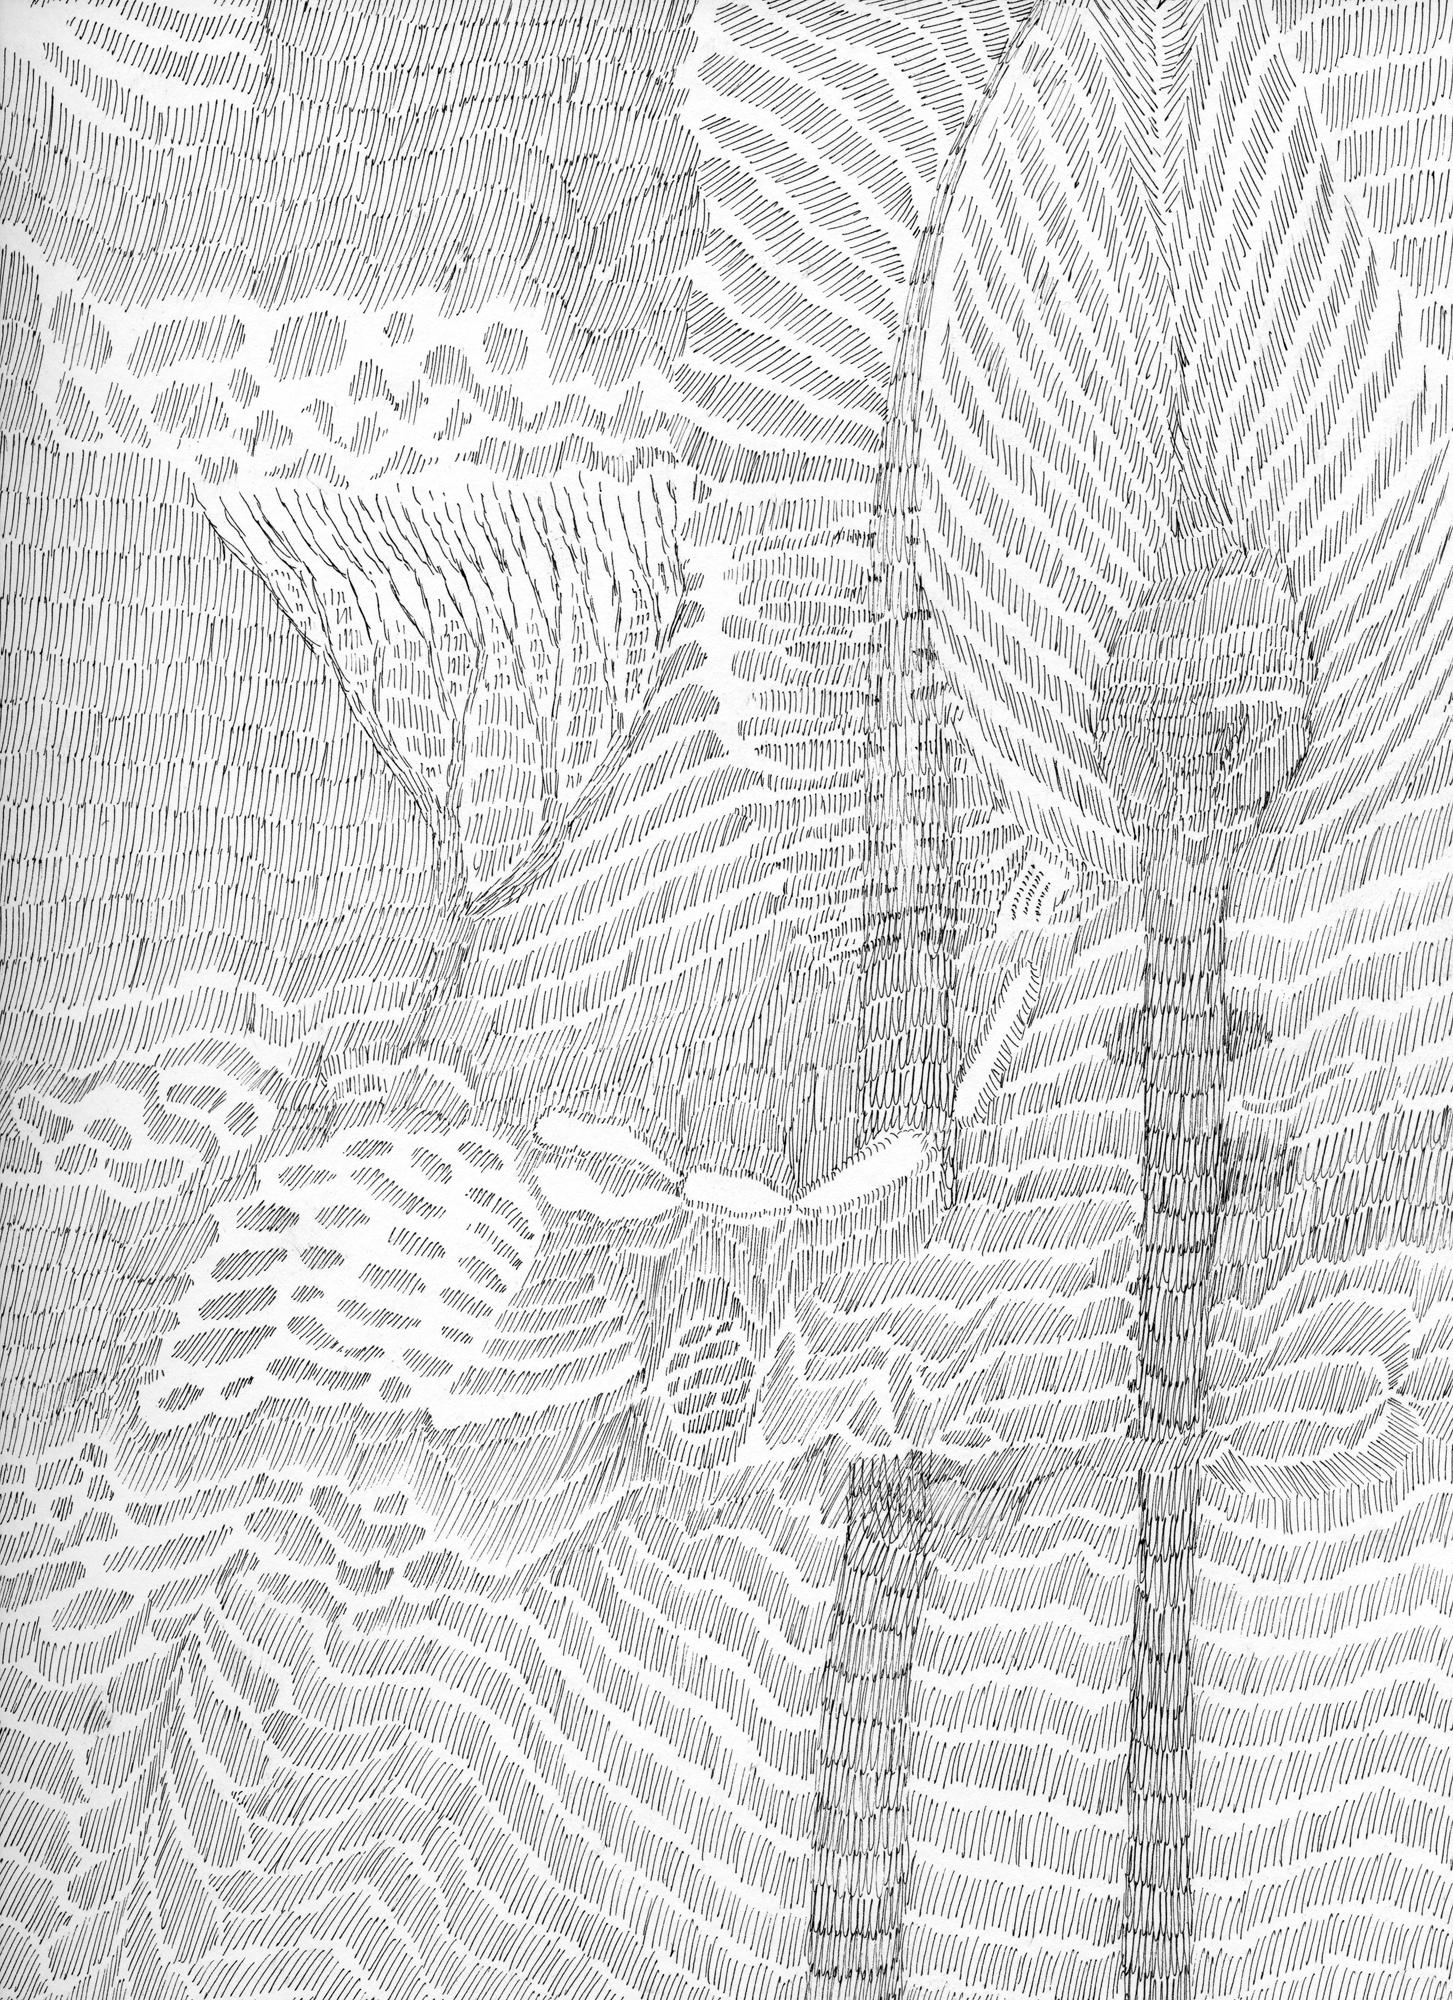 Untitled (Flux 05.21) , 2019 Ink on paper 30.4 cm x 22.8 cm